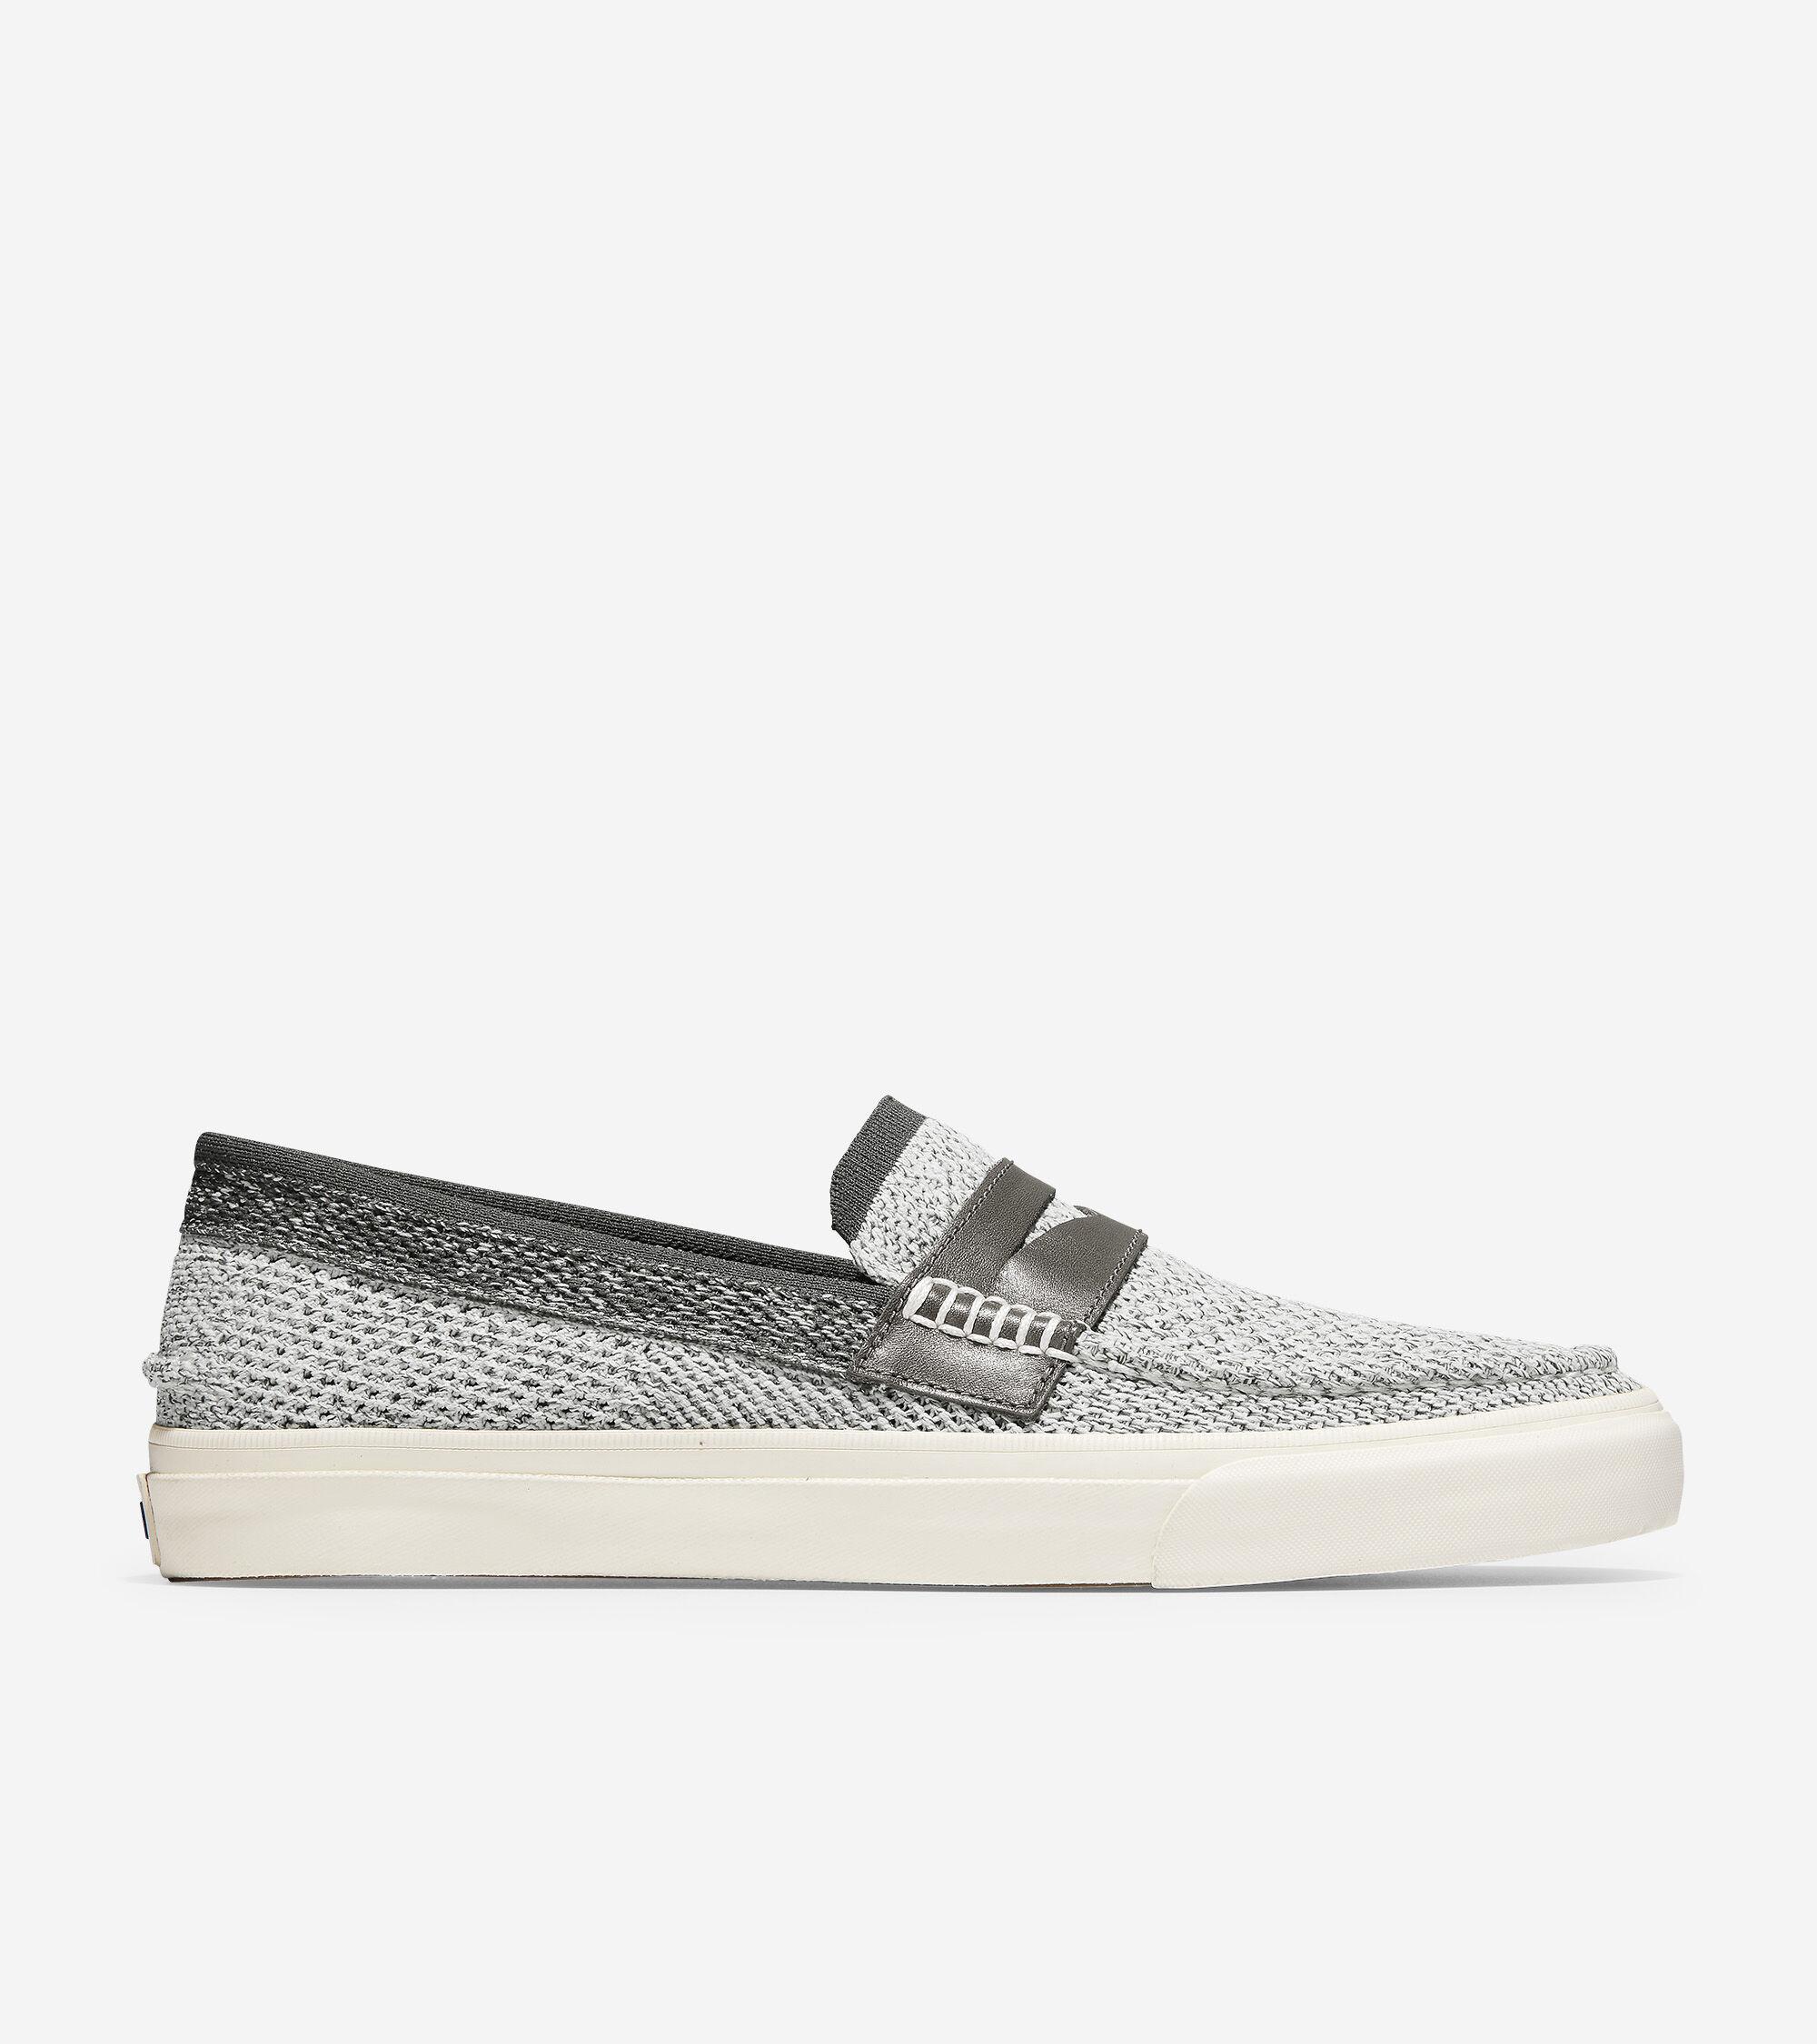 Cole Haan Men's Pinch Weekender Lx StitchLite Slip-On Loafers Men's Shoes 6pCQvbj